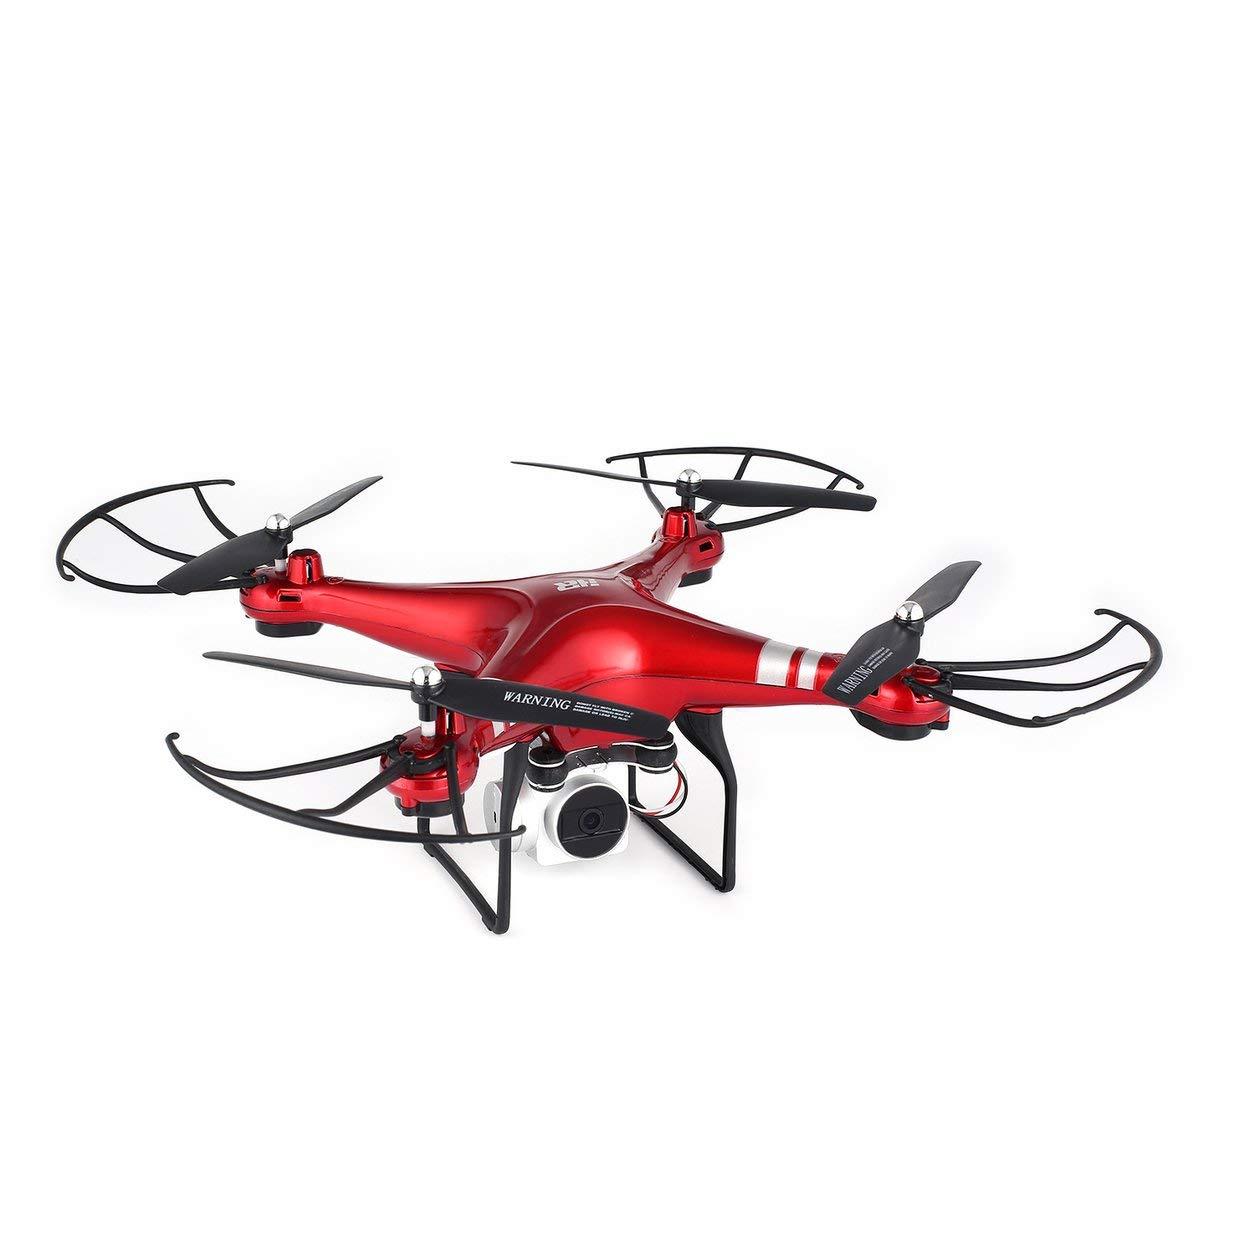 Dailyinshop SH5H 2.4G 1080 P Weitwinkel HD Kamera FPV Drone RC Quadcopter Höhe Halten